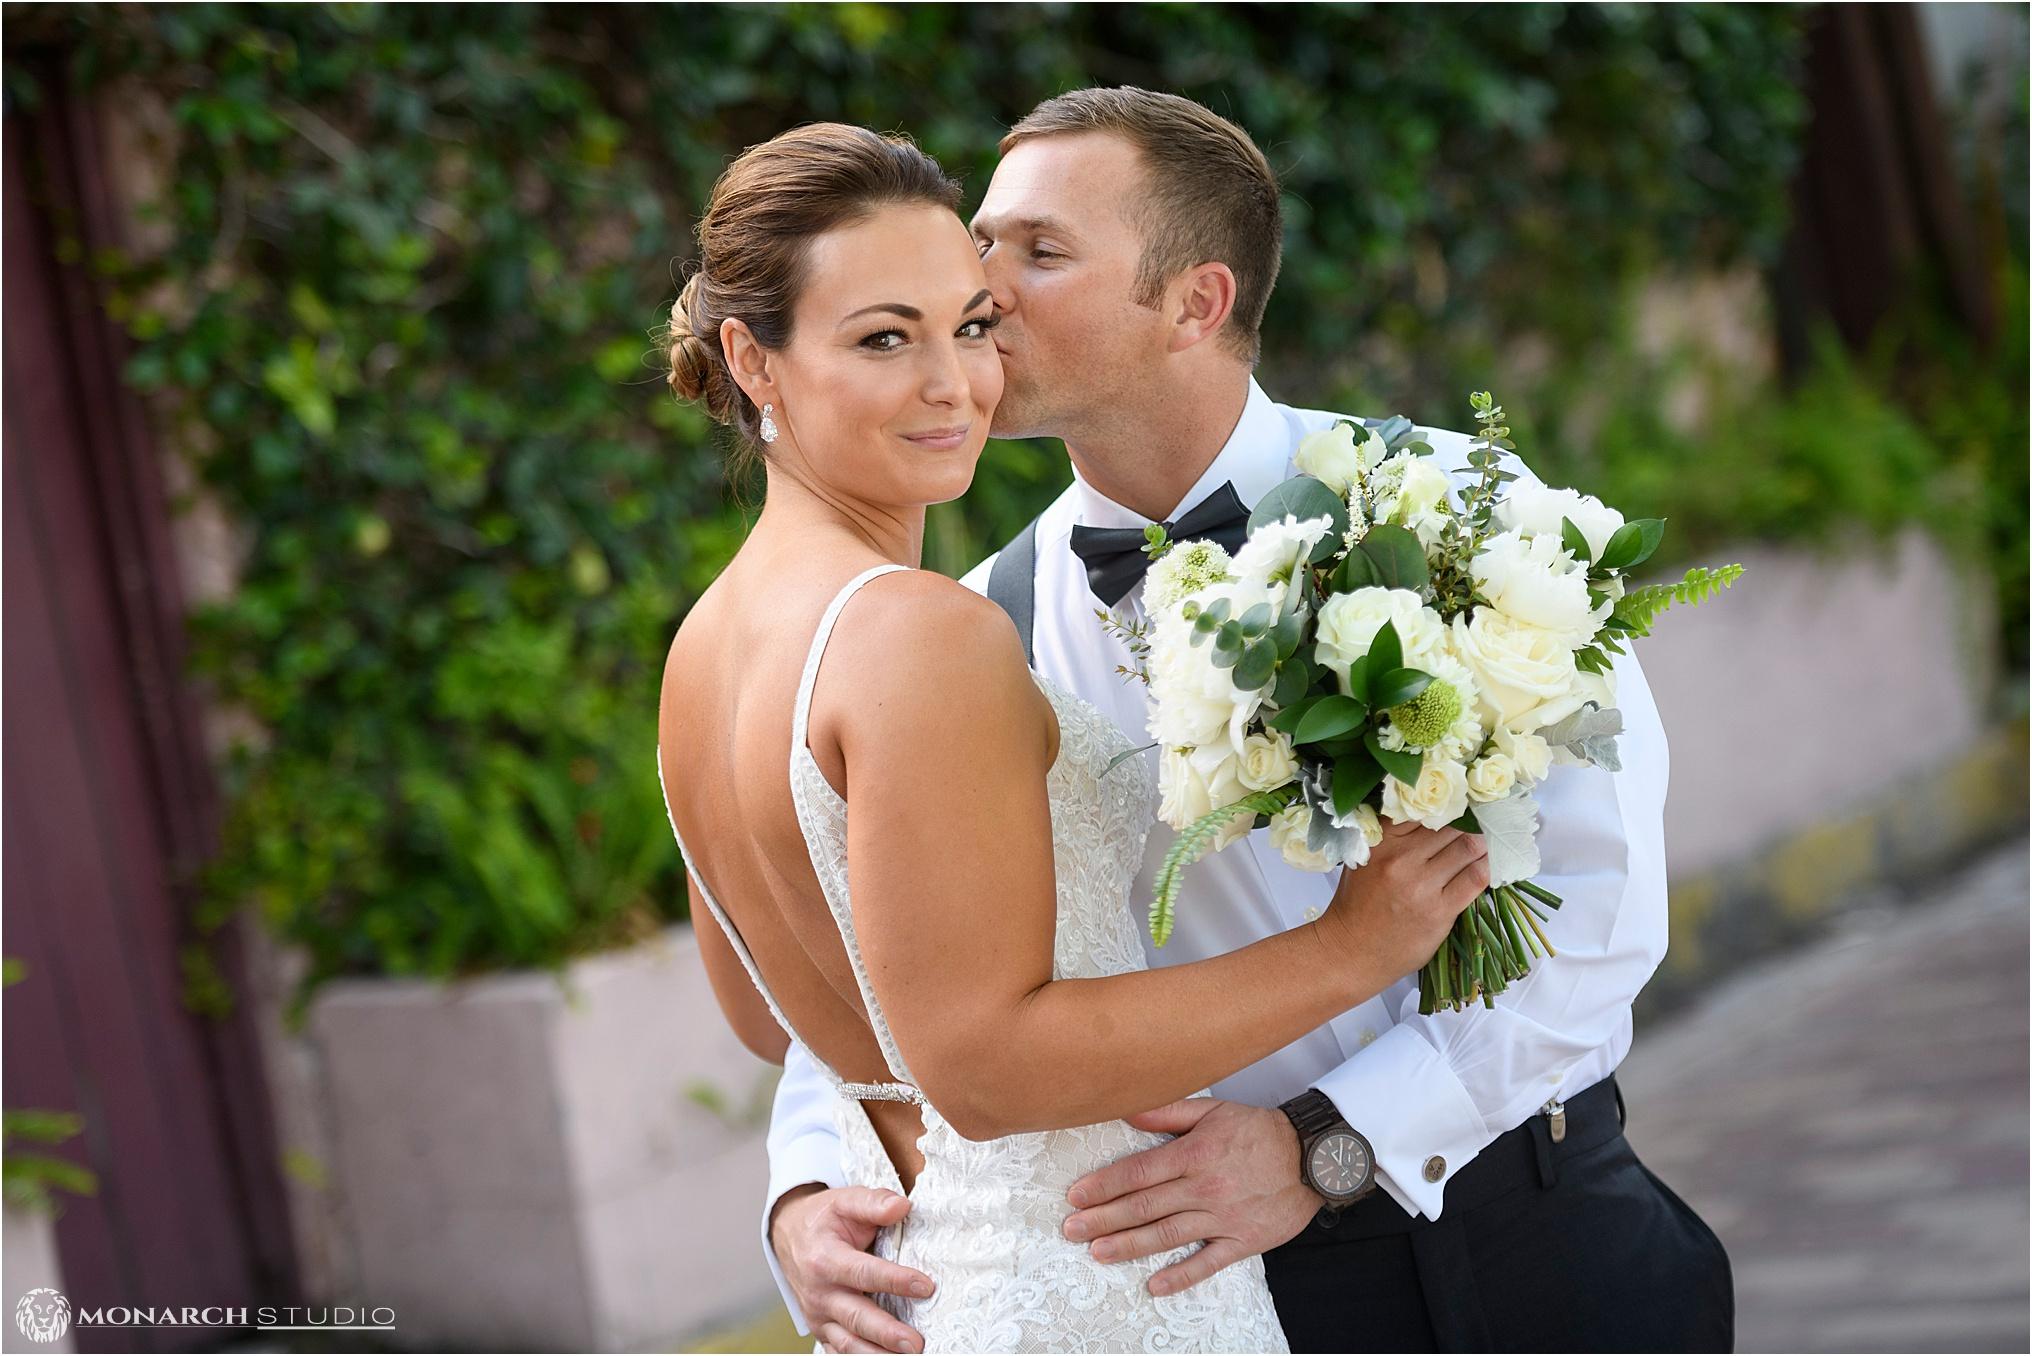 045-whiteroom-wedding-photographer-2019-05-22_0027.jpg